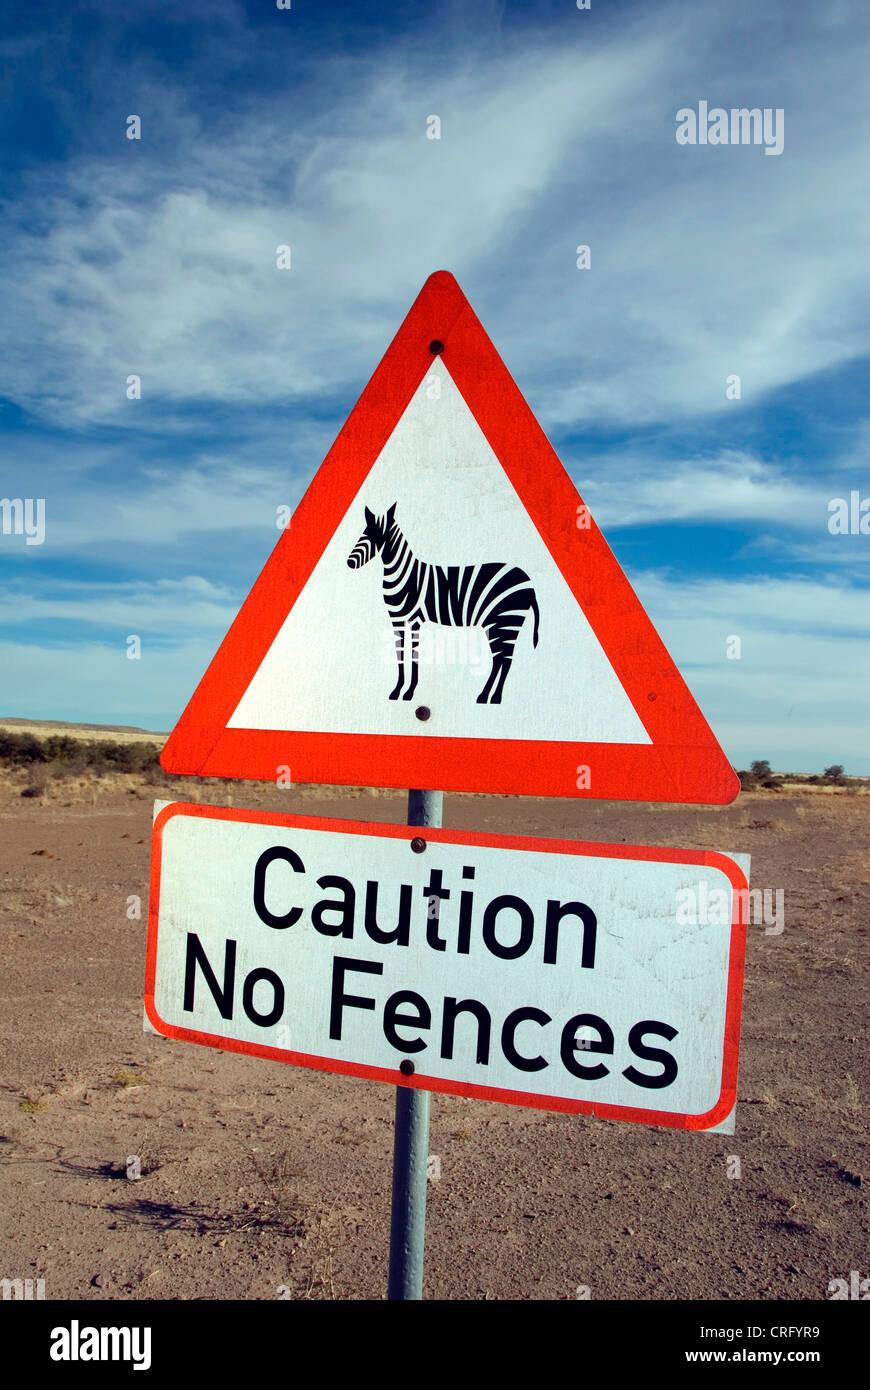 traffic sign, cution zebras, no fences, Namibia - Stock Image